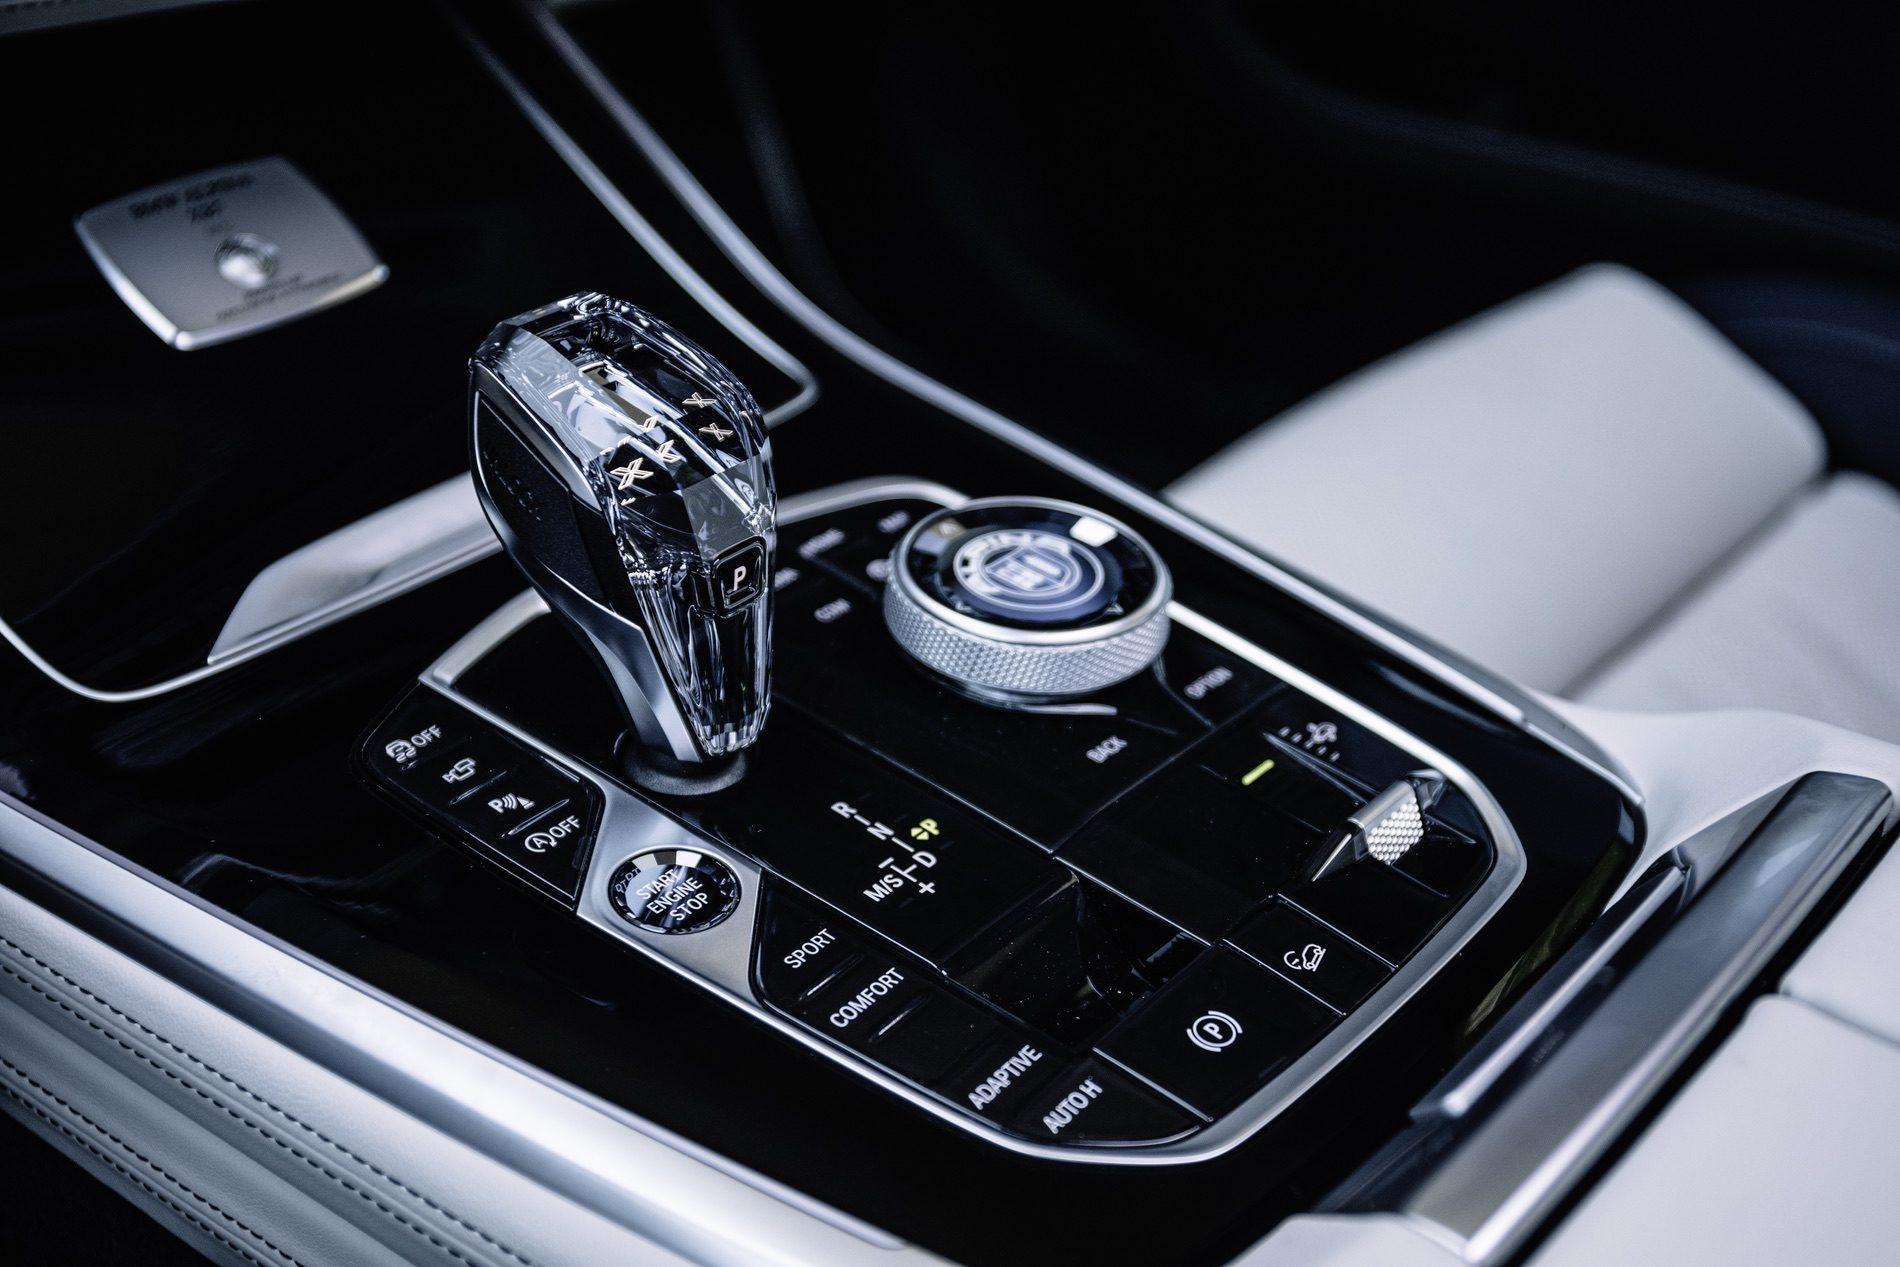 Phien ban BMW X7 hieu nang cao anh 24